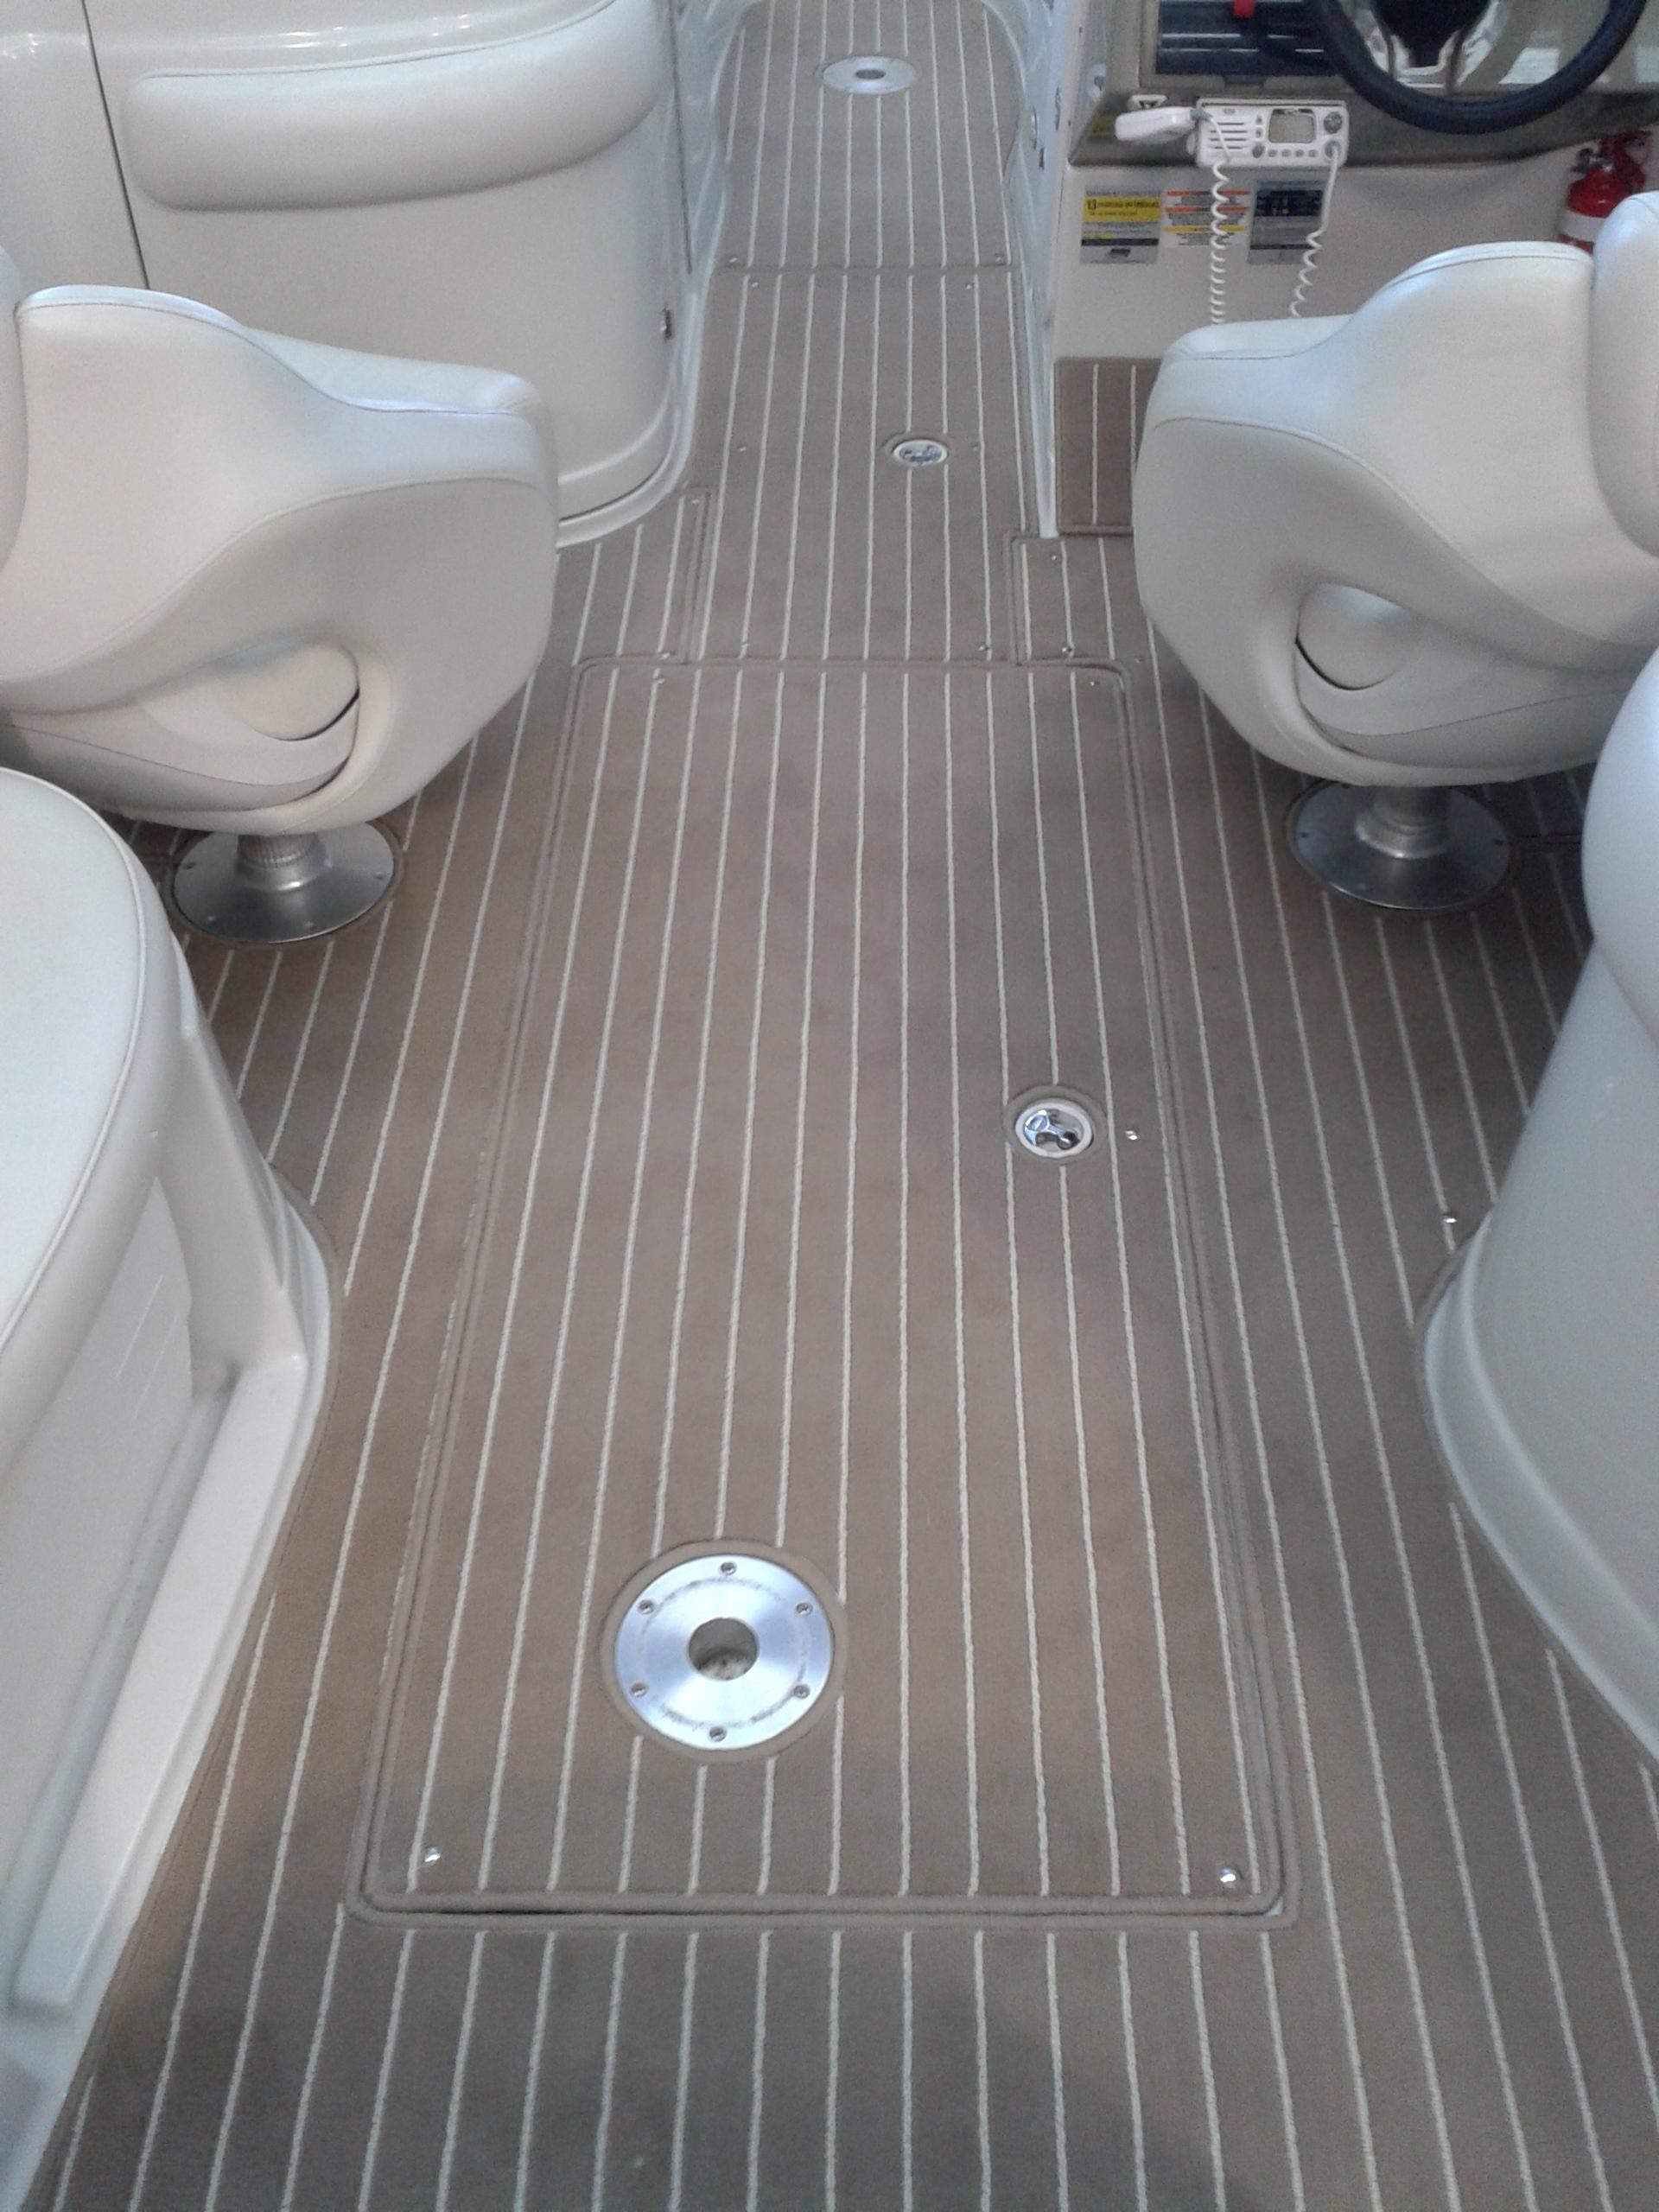 Boat Carpet Prestige Marine Trimmers Covers Perth Bimini Tops Carpet